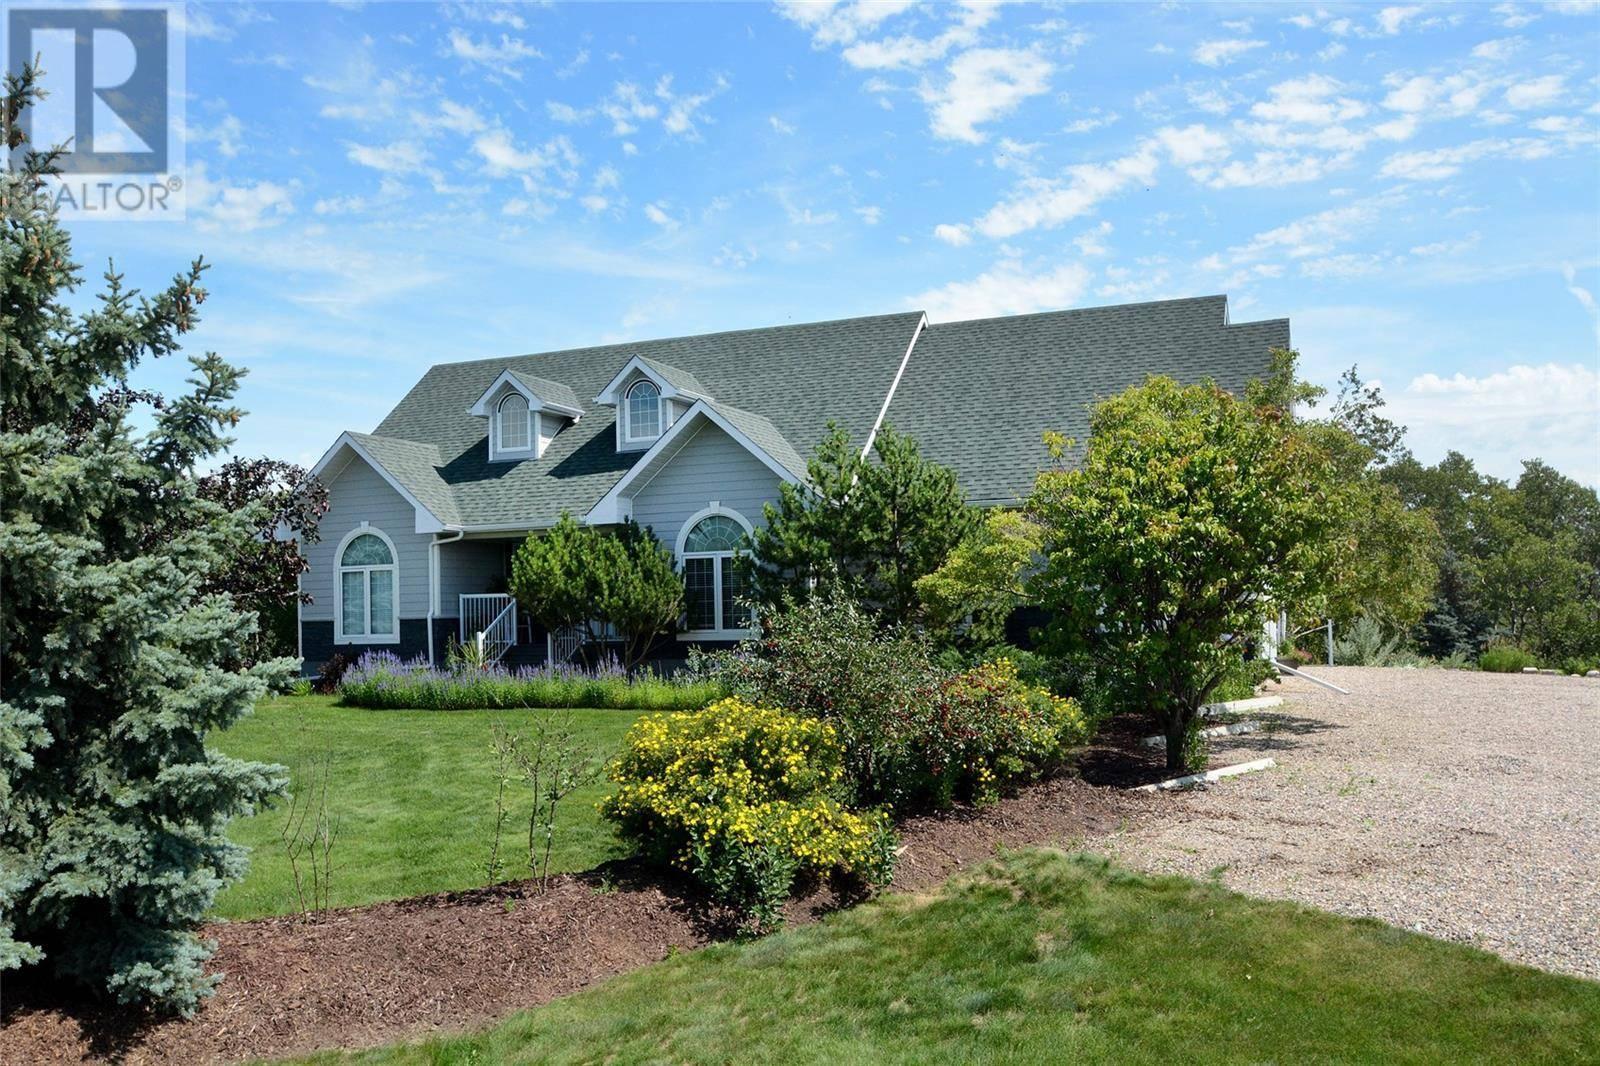 House for sale at 116 Maple Rd Aberdeen Rm No. 373 Saskatchewan - MLS: SK782548